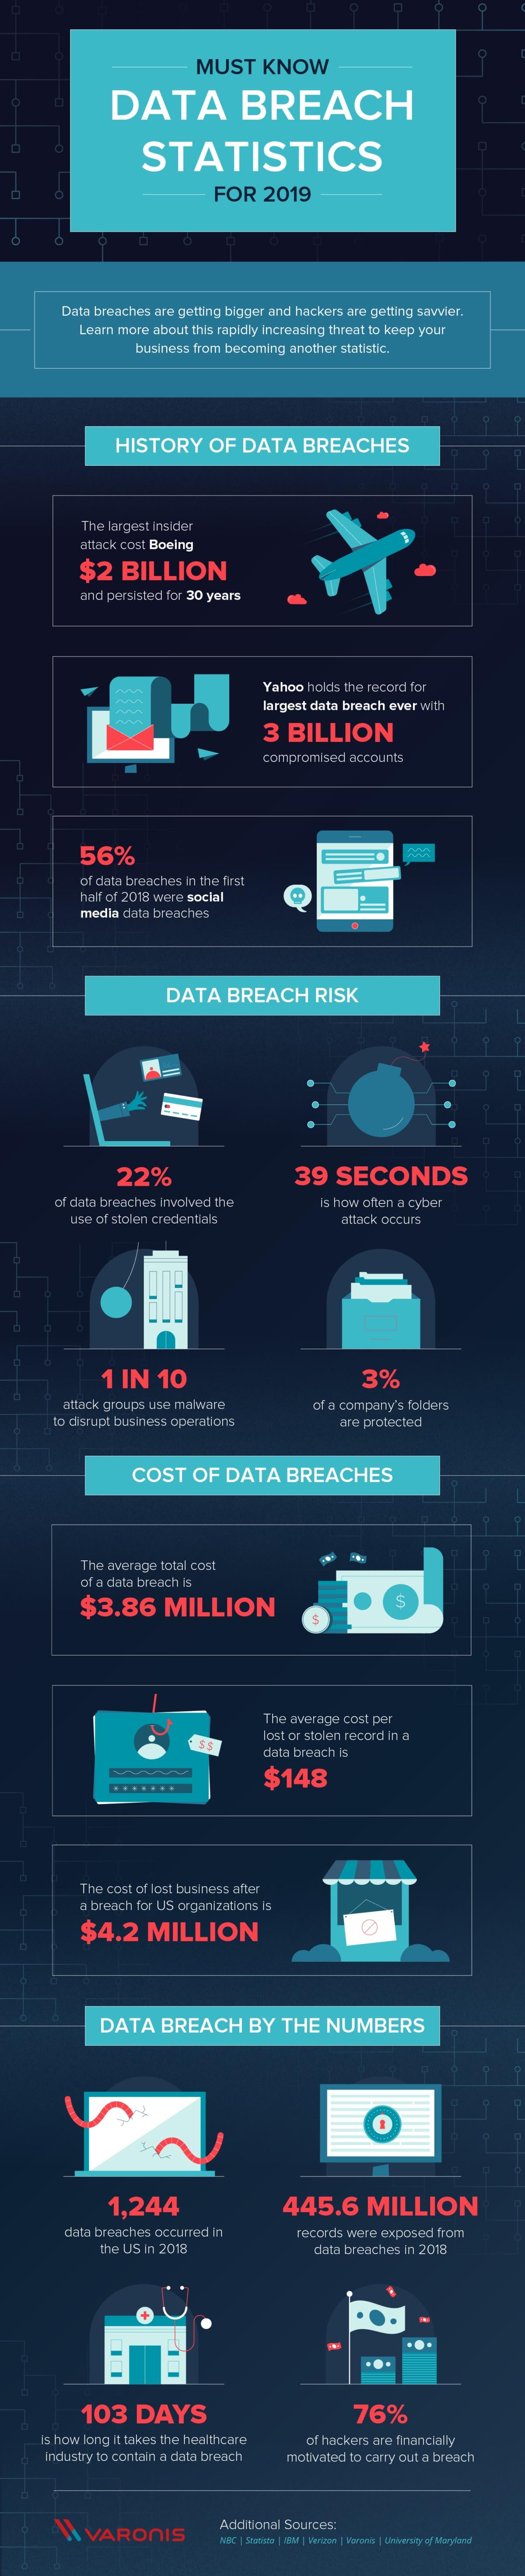 Data Breach info